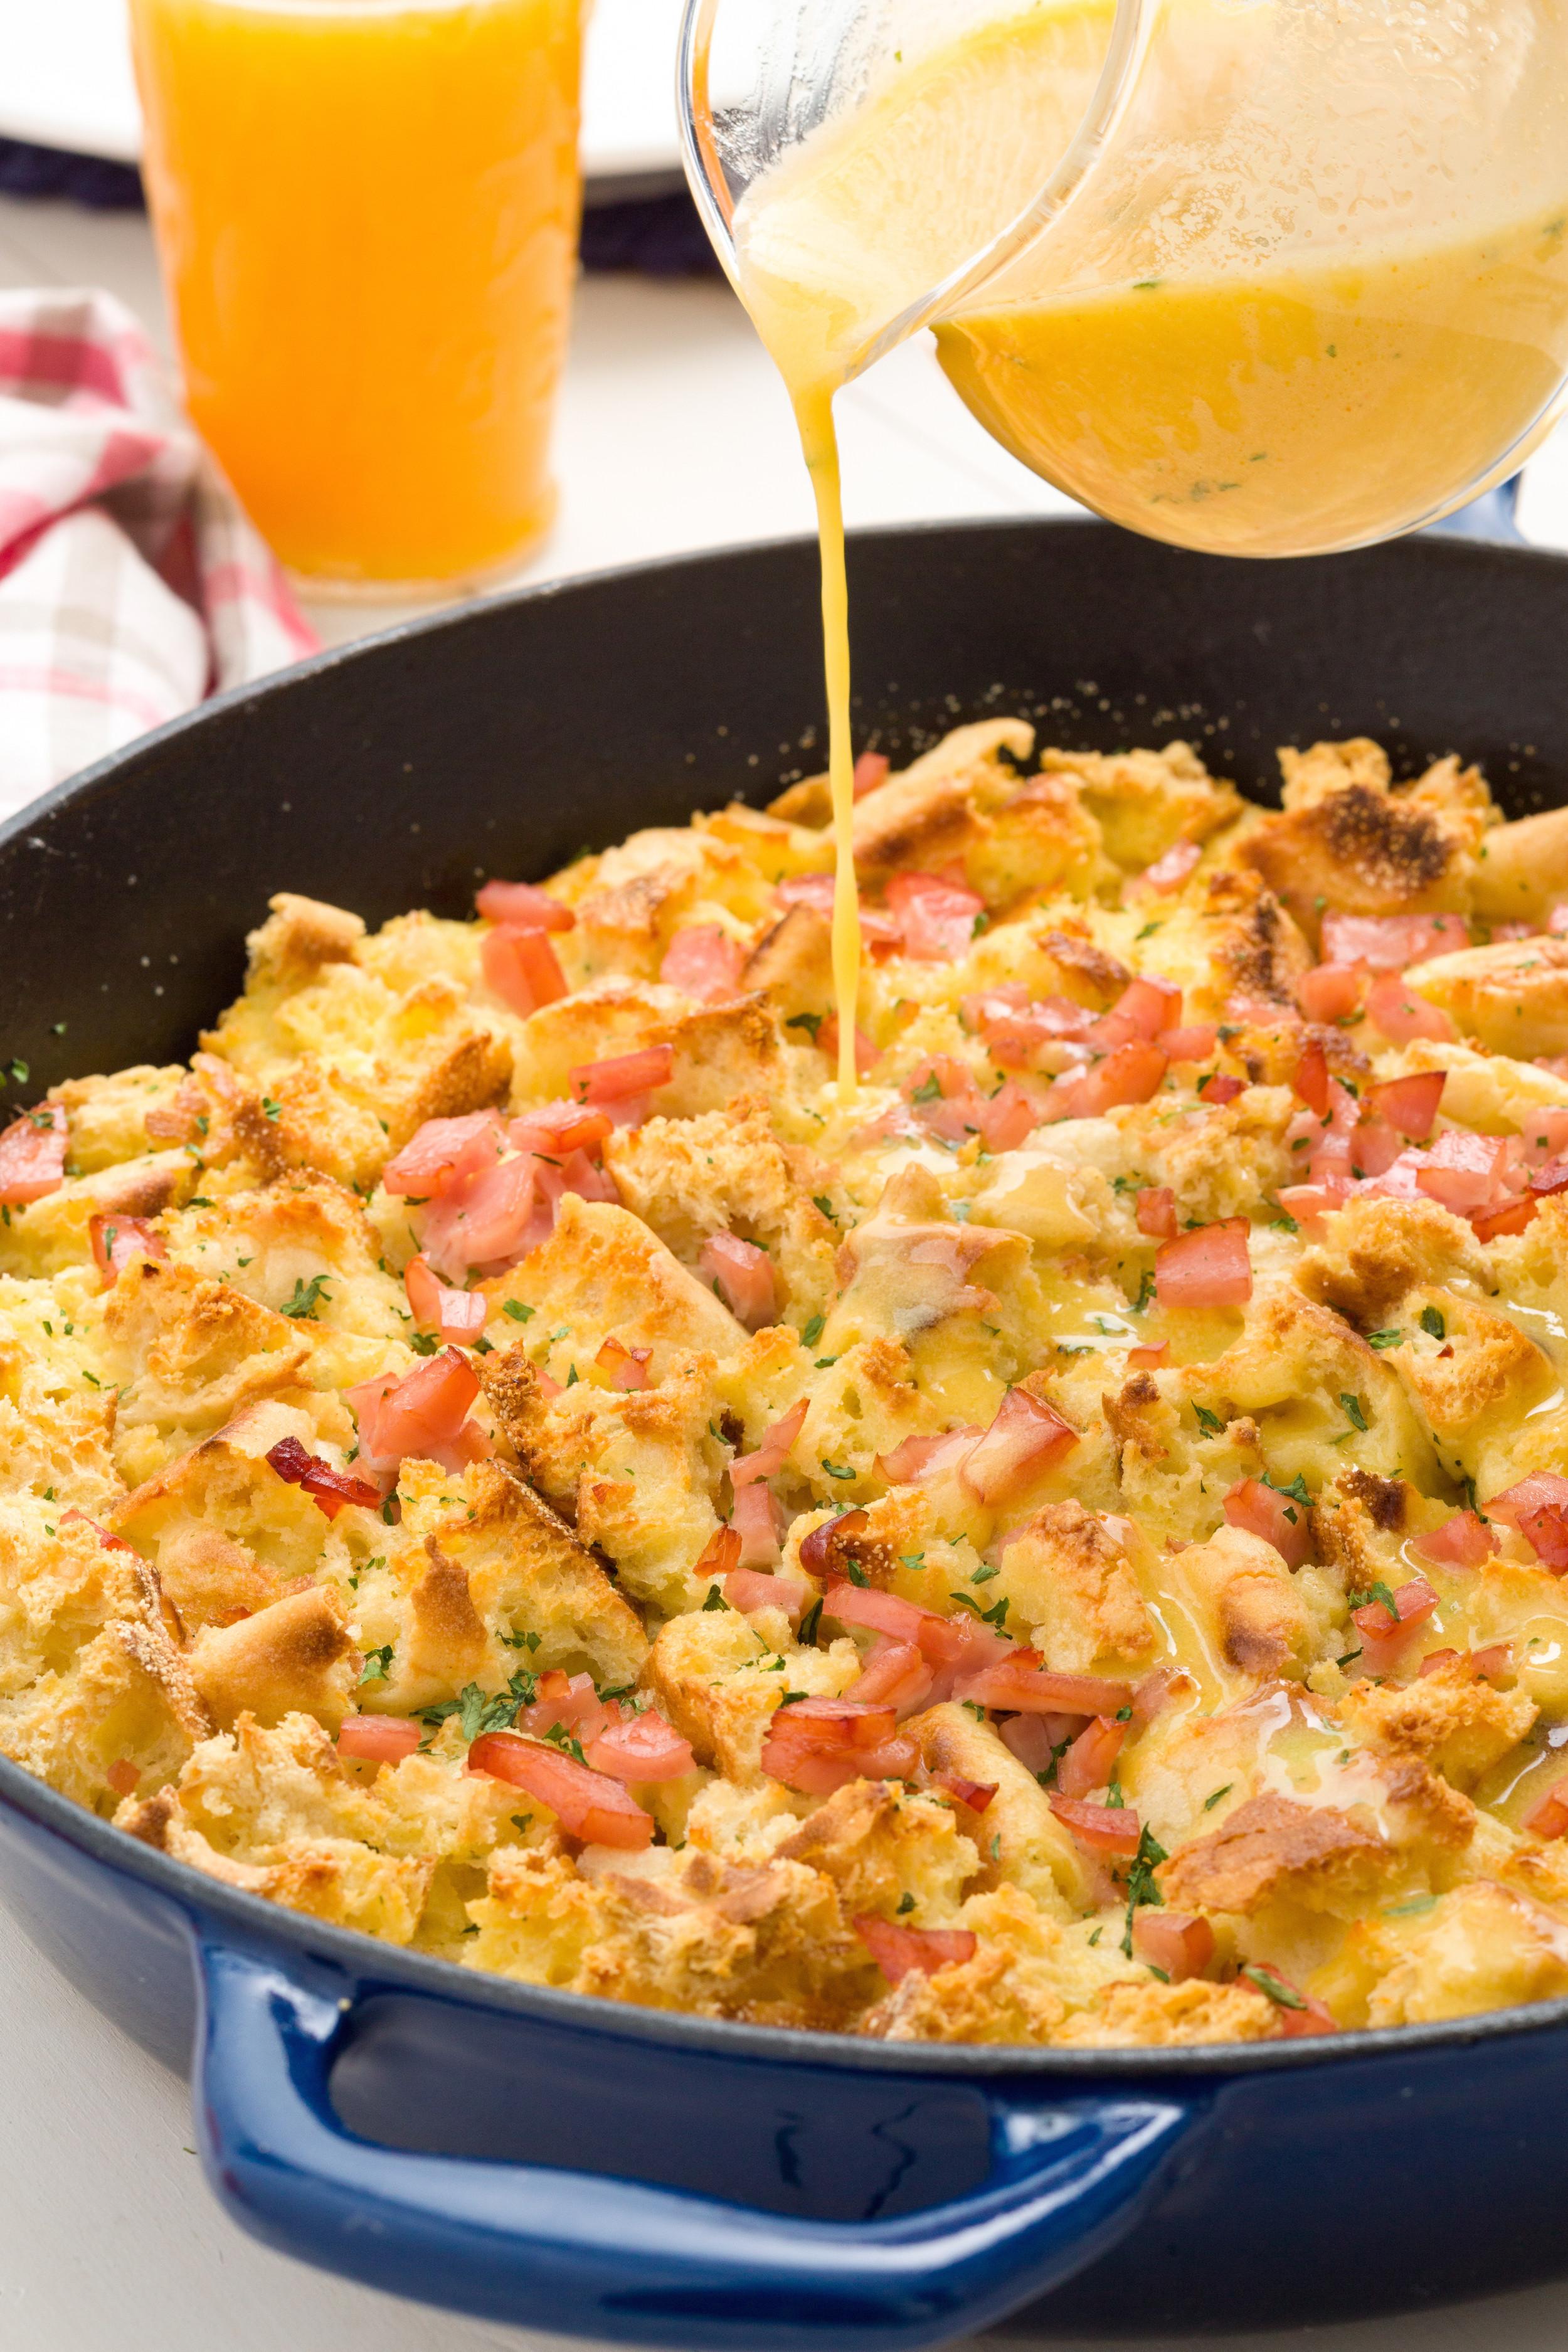 Breakfast Recipe Ideas  New Year s Day Brunch Recipes—Delish